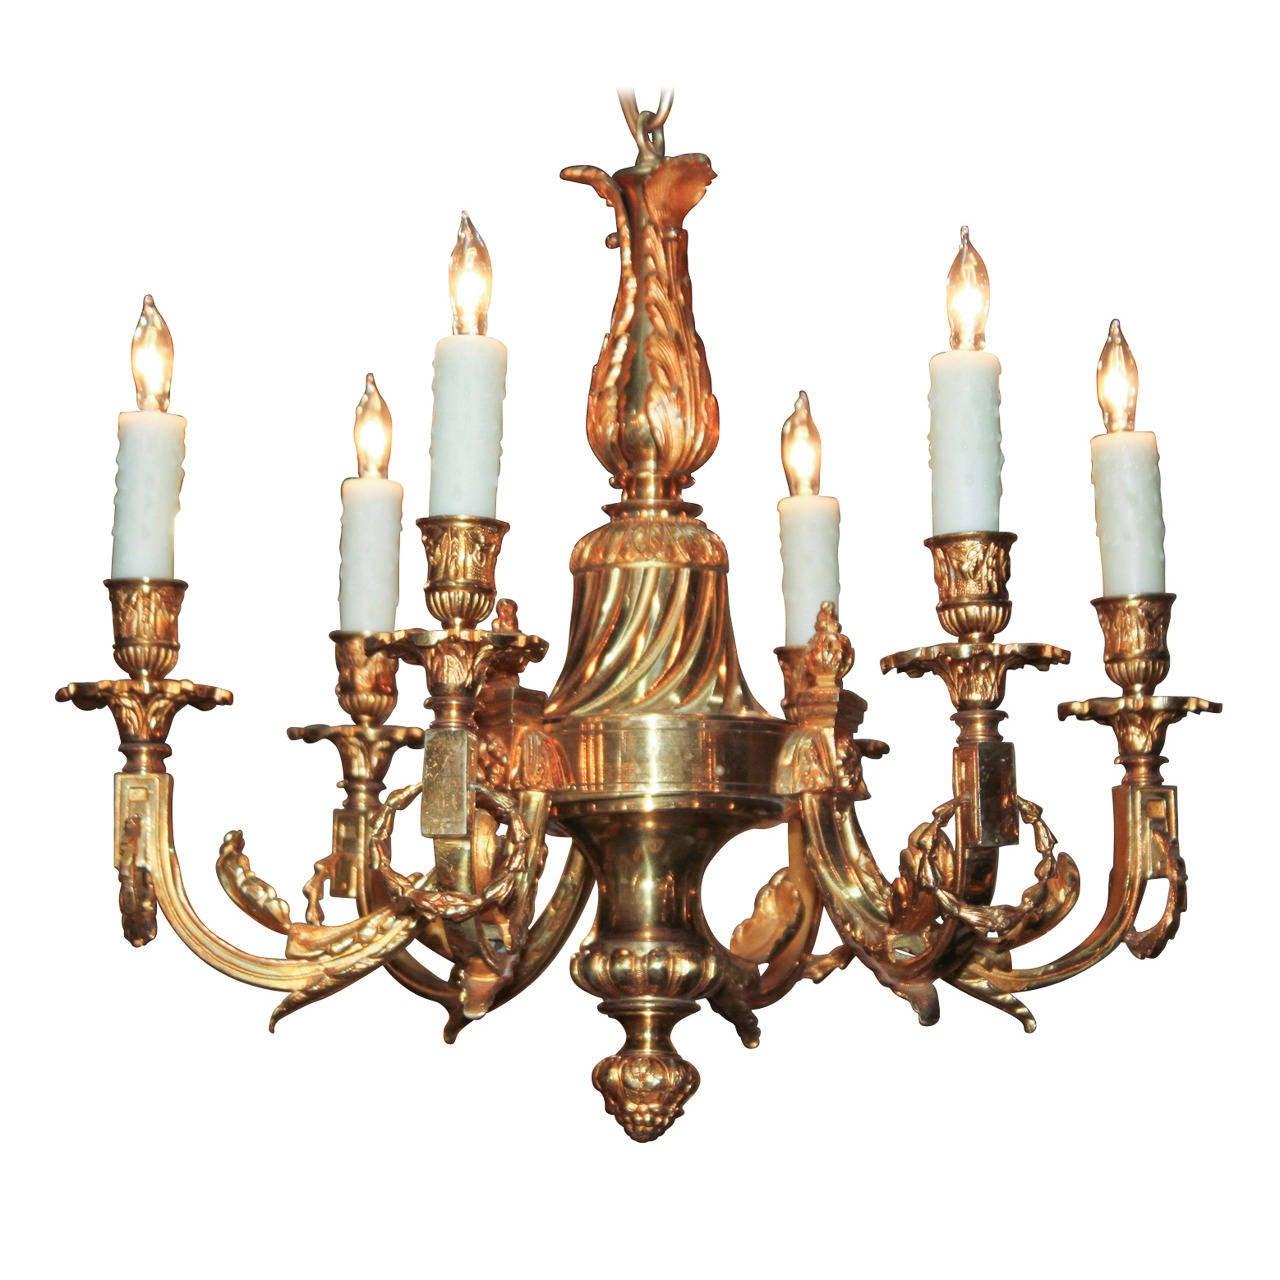 19th c. French Bronze Chandelier